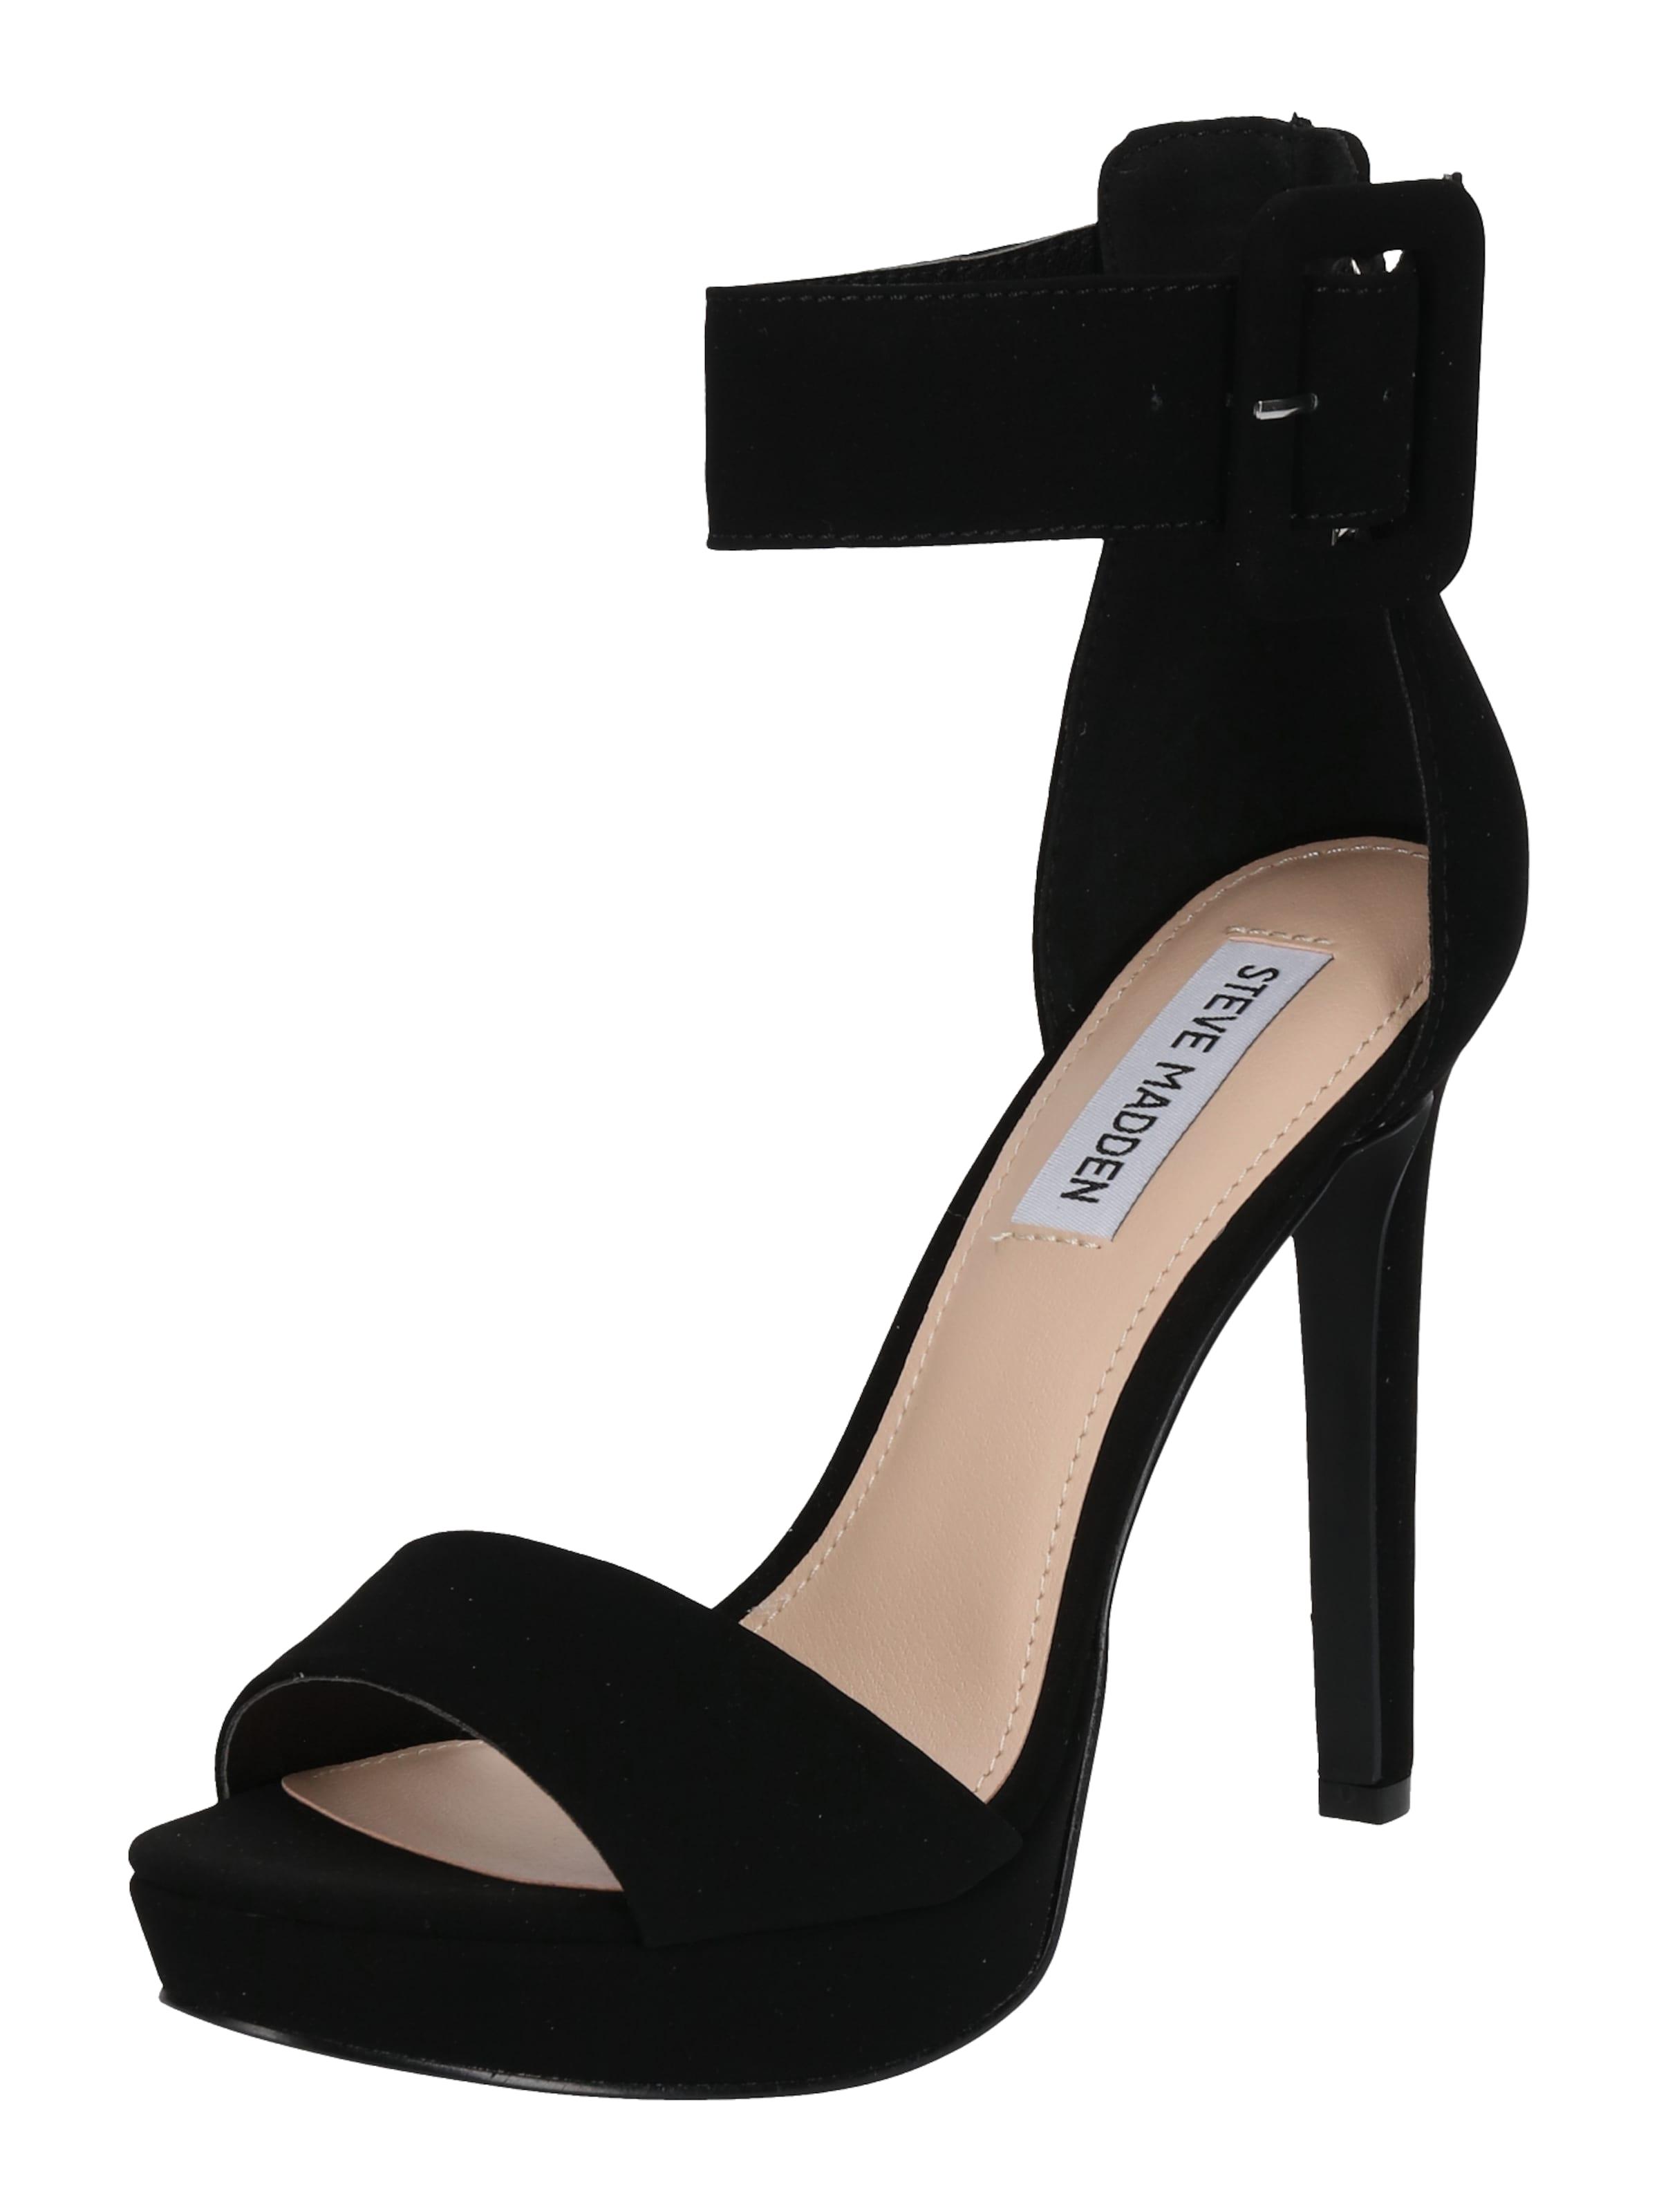 STEVE MADDEN Sandalette COCO Verschleißfeste billige Schuhe